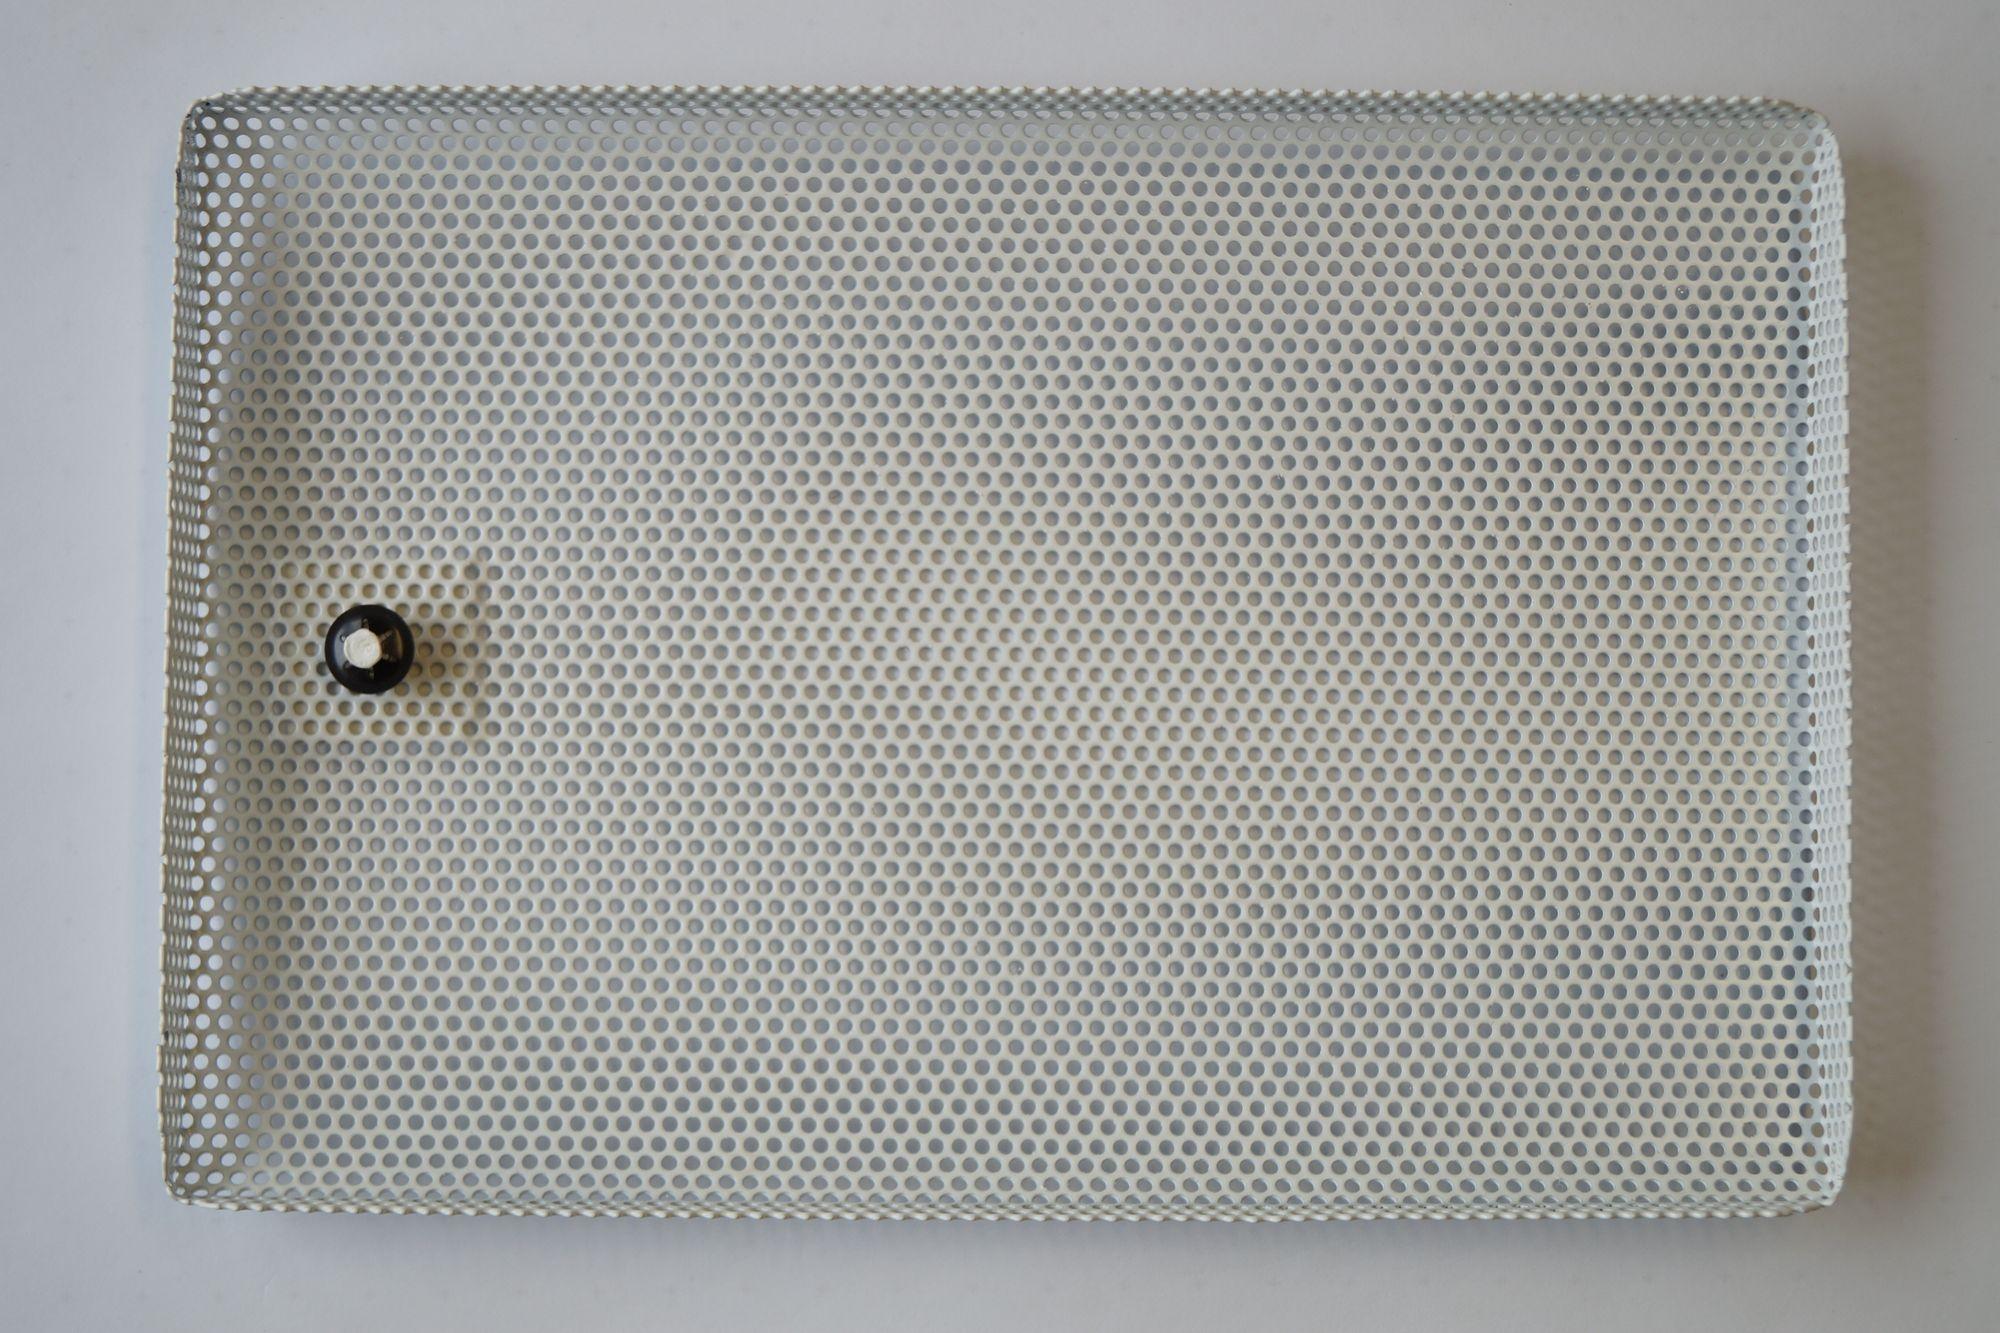 1 Stück Magnat Interior Pro Lautsprecherabdeckung weiß Neu – Bild 2